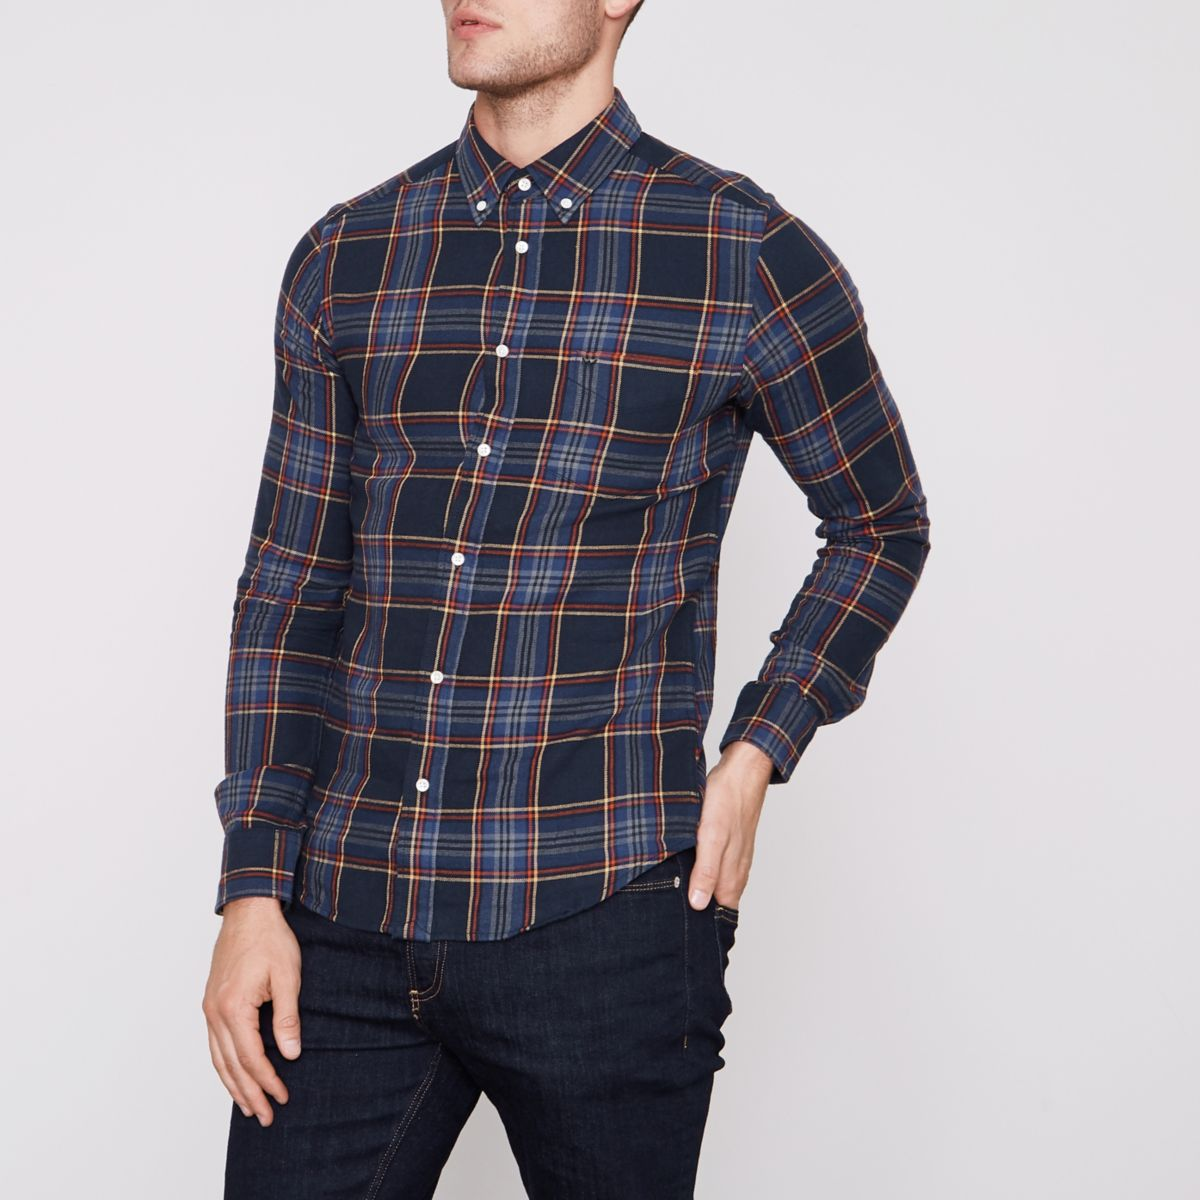 Wrangler navy long sleeve check shirt